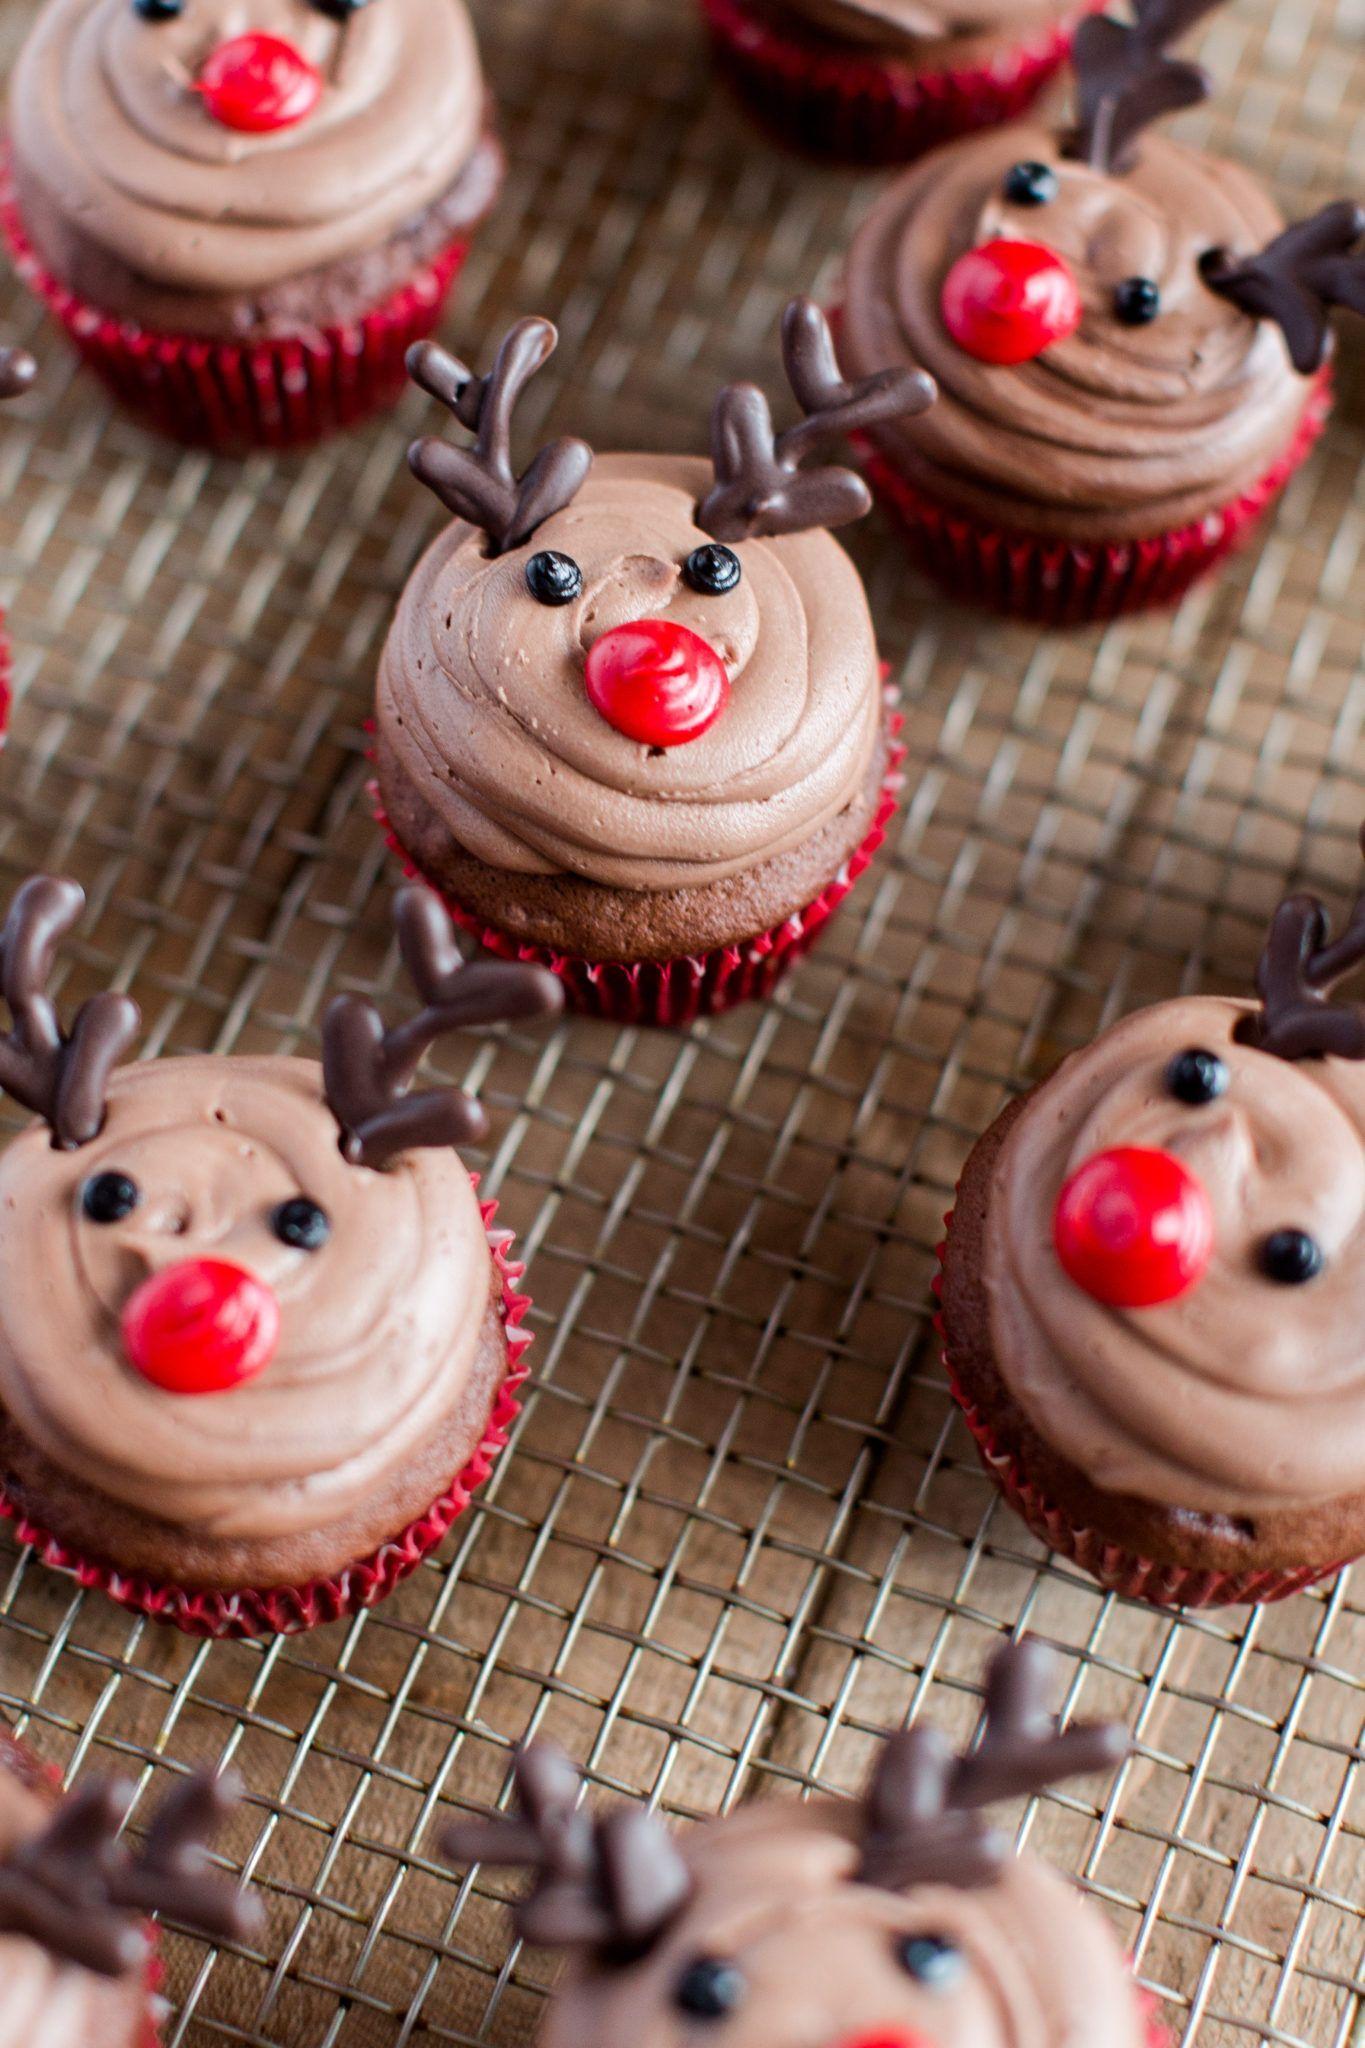 Easy Reindeer Cupcakes -  Easy Reindeer Cupcakes | Christmas dessert recipes | holiday dessert recipes | fun cupcake recipes  - #Cupcakes #Easy #recipesappetizers #recipesaroundtheworld #recipescrockpot #recipesdessert #Reindeer